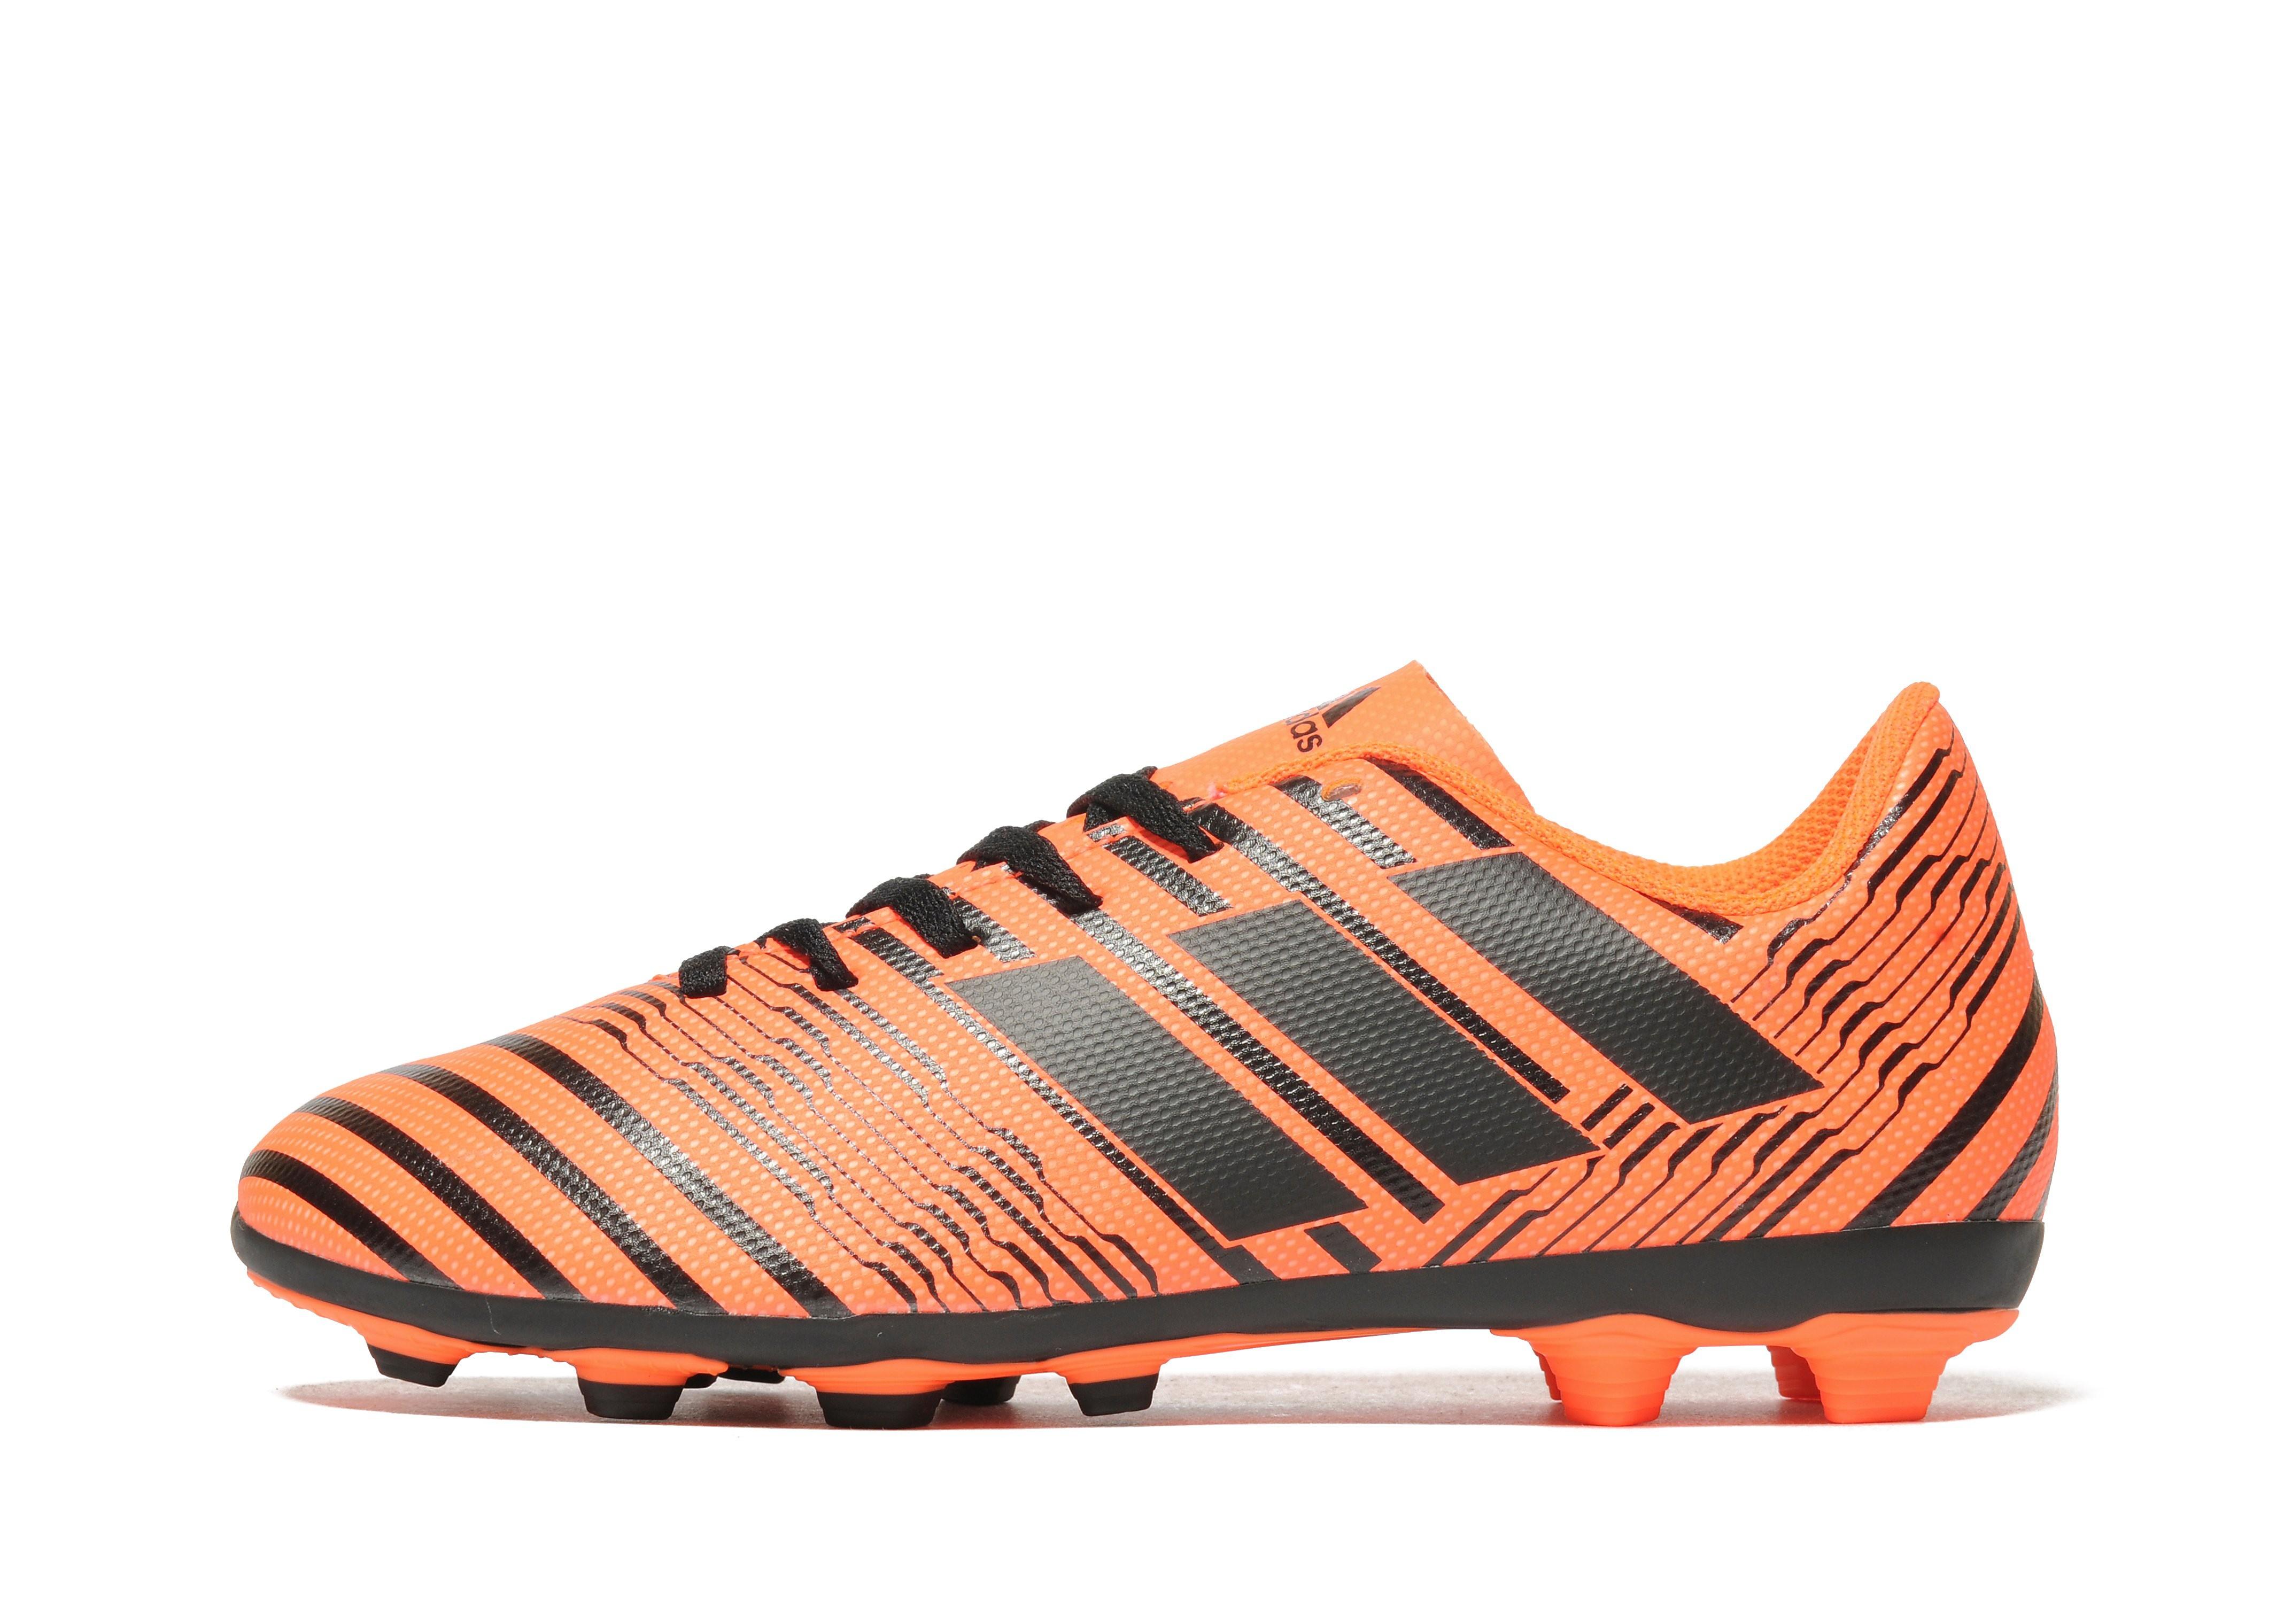 Image de adidas adidas NEMEZIZ 17.4 FG Enfants - Orange, Orange